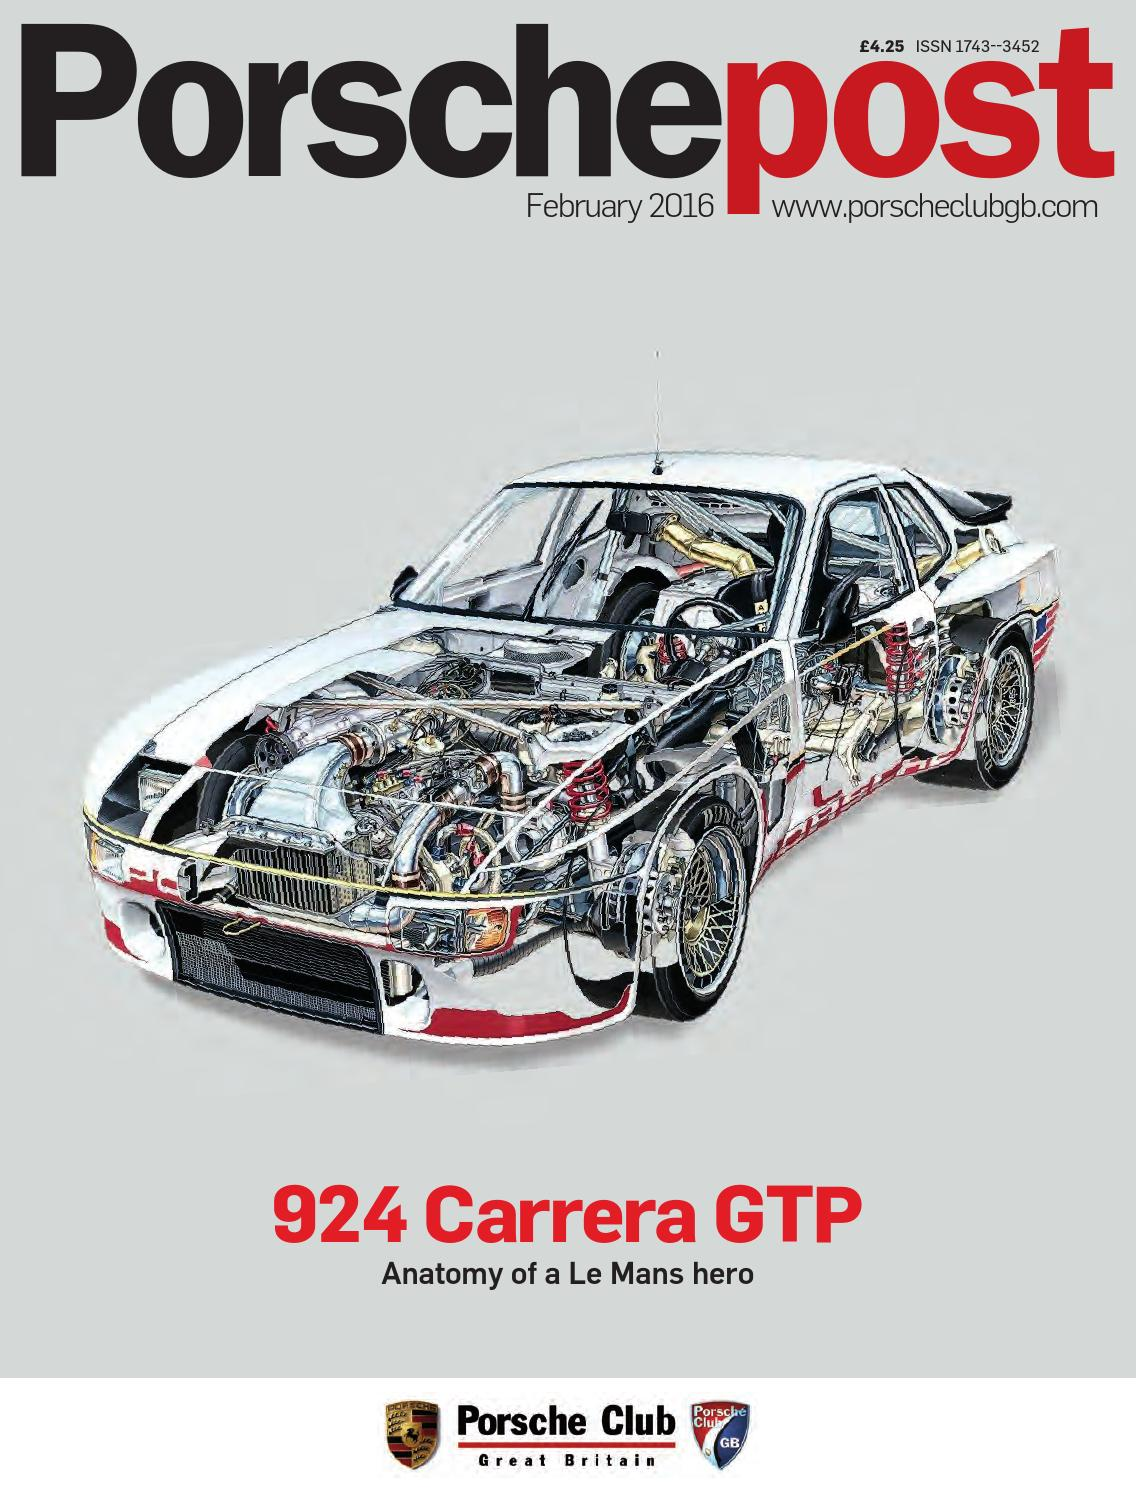 917aa157b Porsche Post February 2016 by Porsche Club Great Britain - issuu